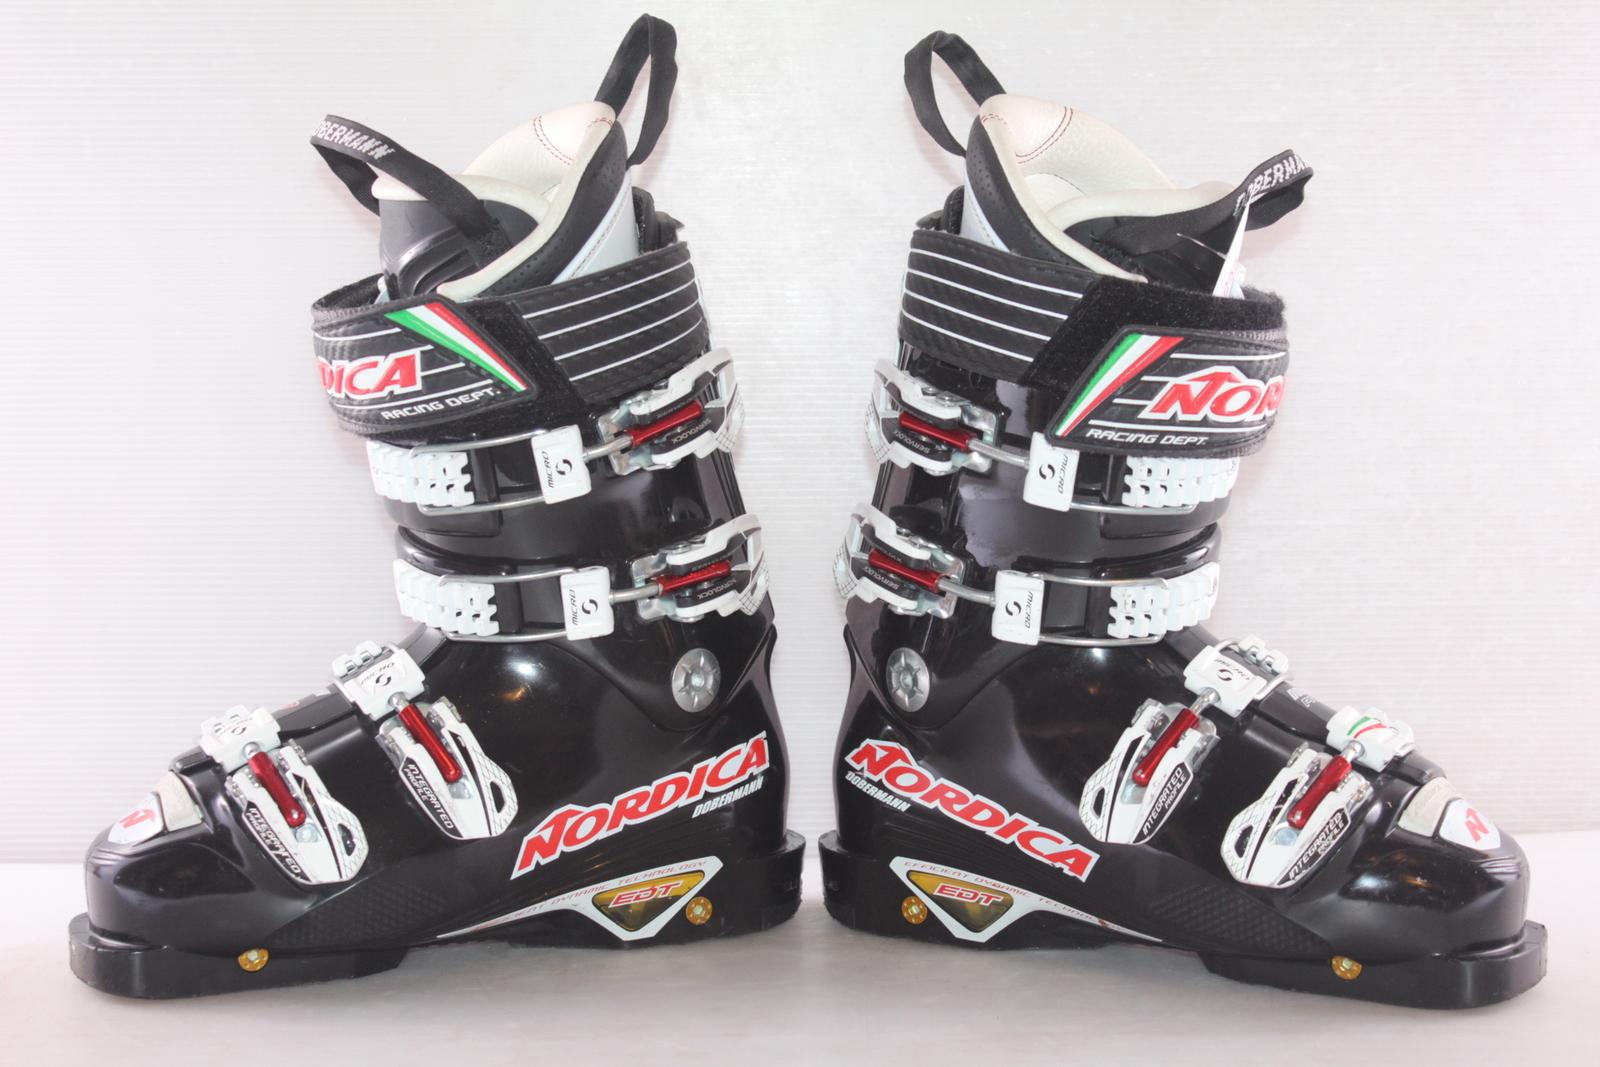 Lyžařské boty Nordica Dobermann PRO  130 vel. EU37 flexe 130